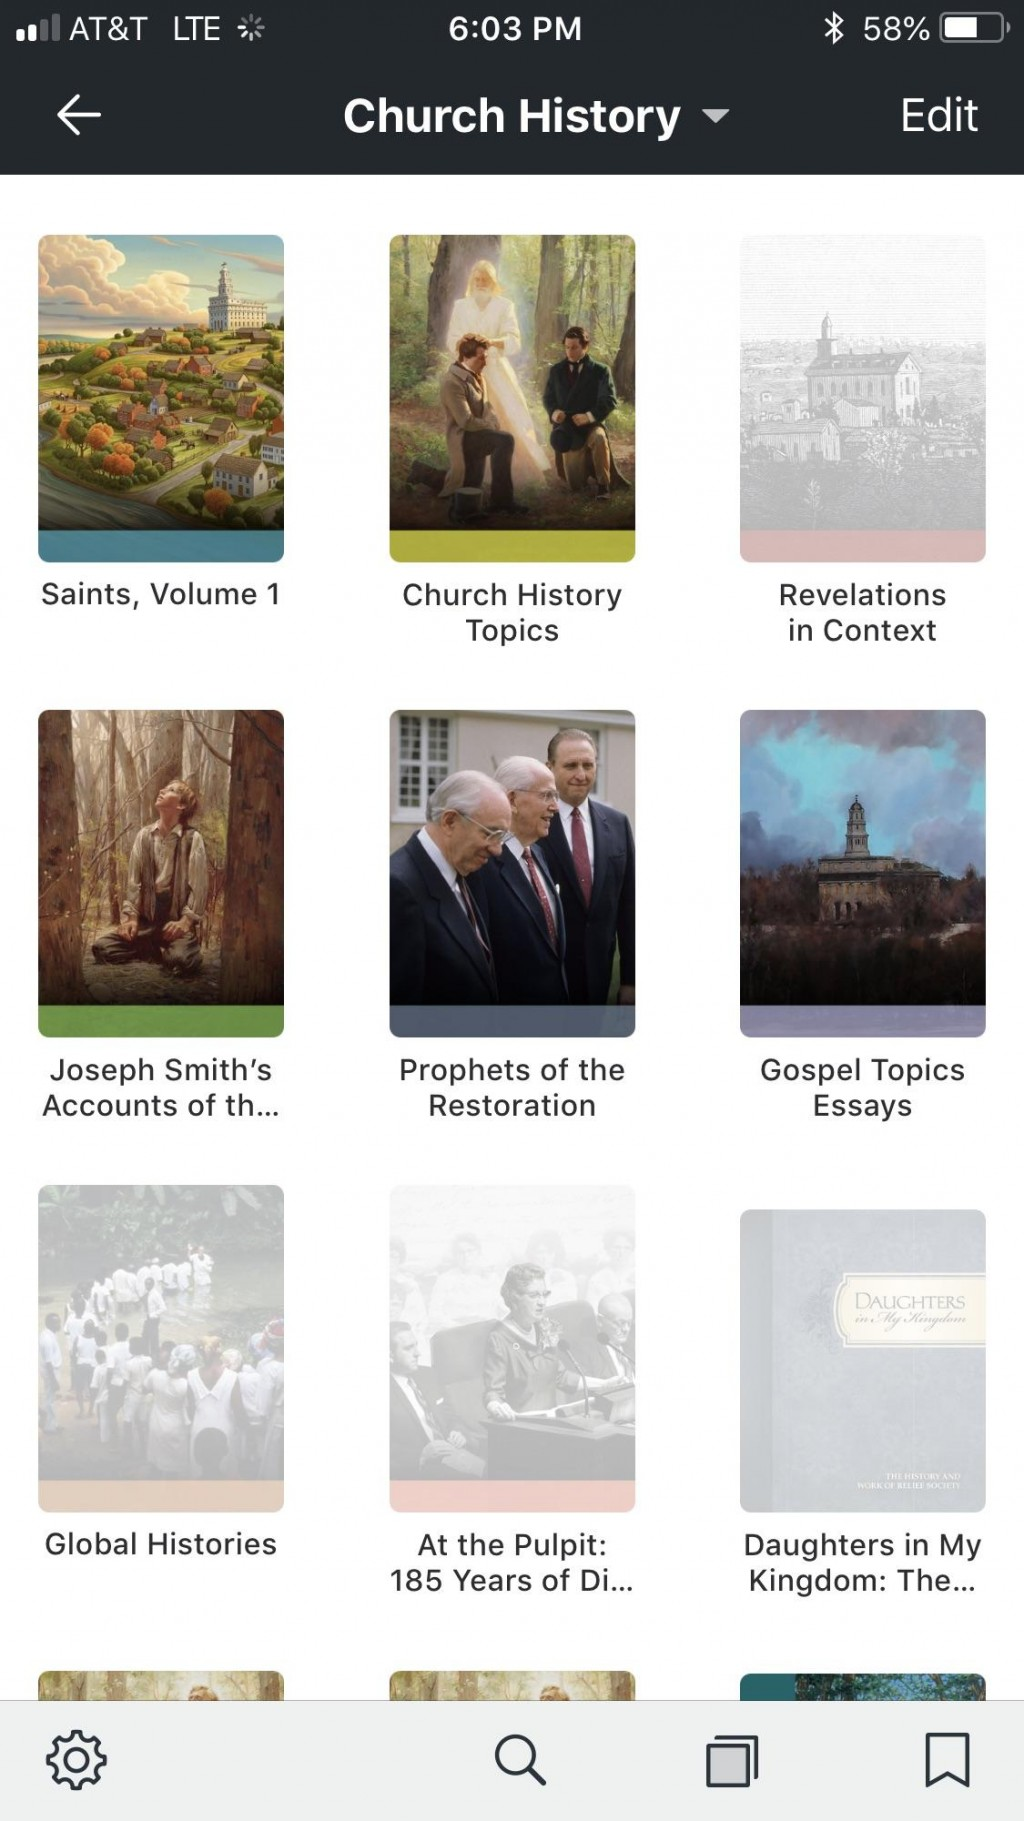 004 Y3rimfgj5jh11 Gospel Topics Essays Essay Outstanding Book Of Abraham Pdf Mormon Translation Large